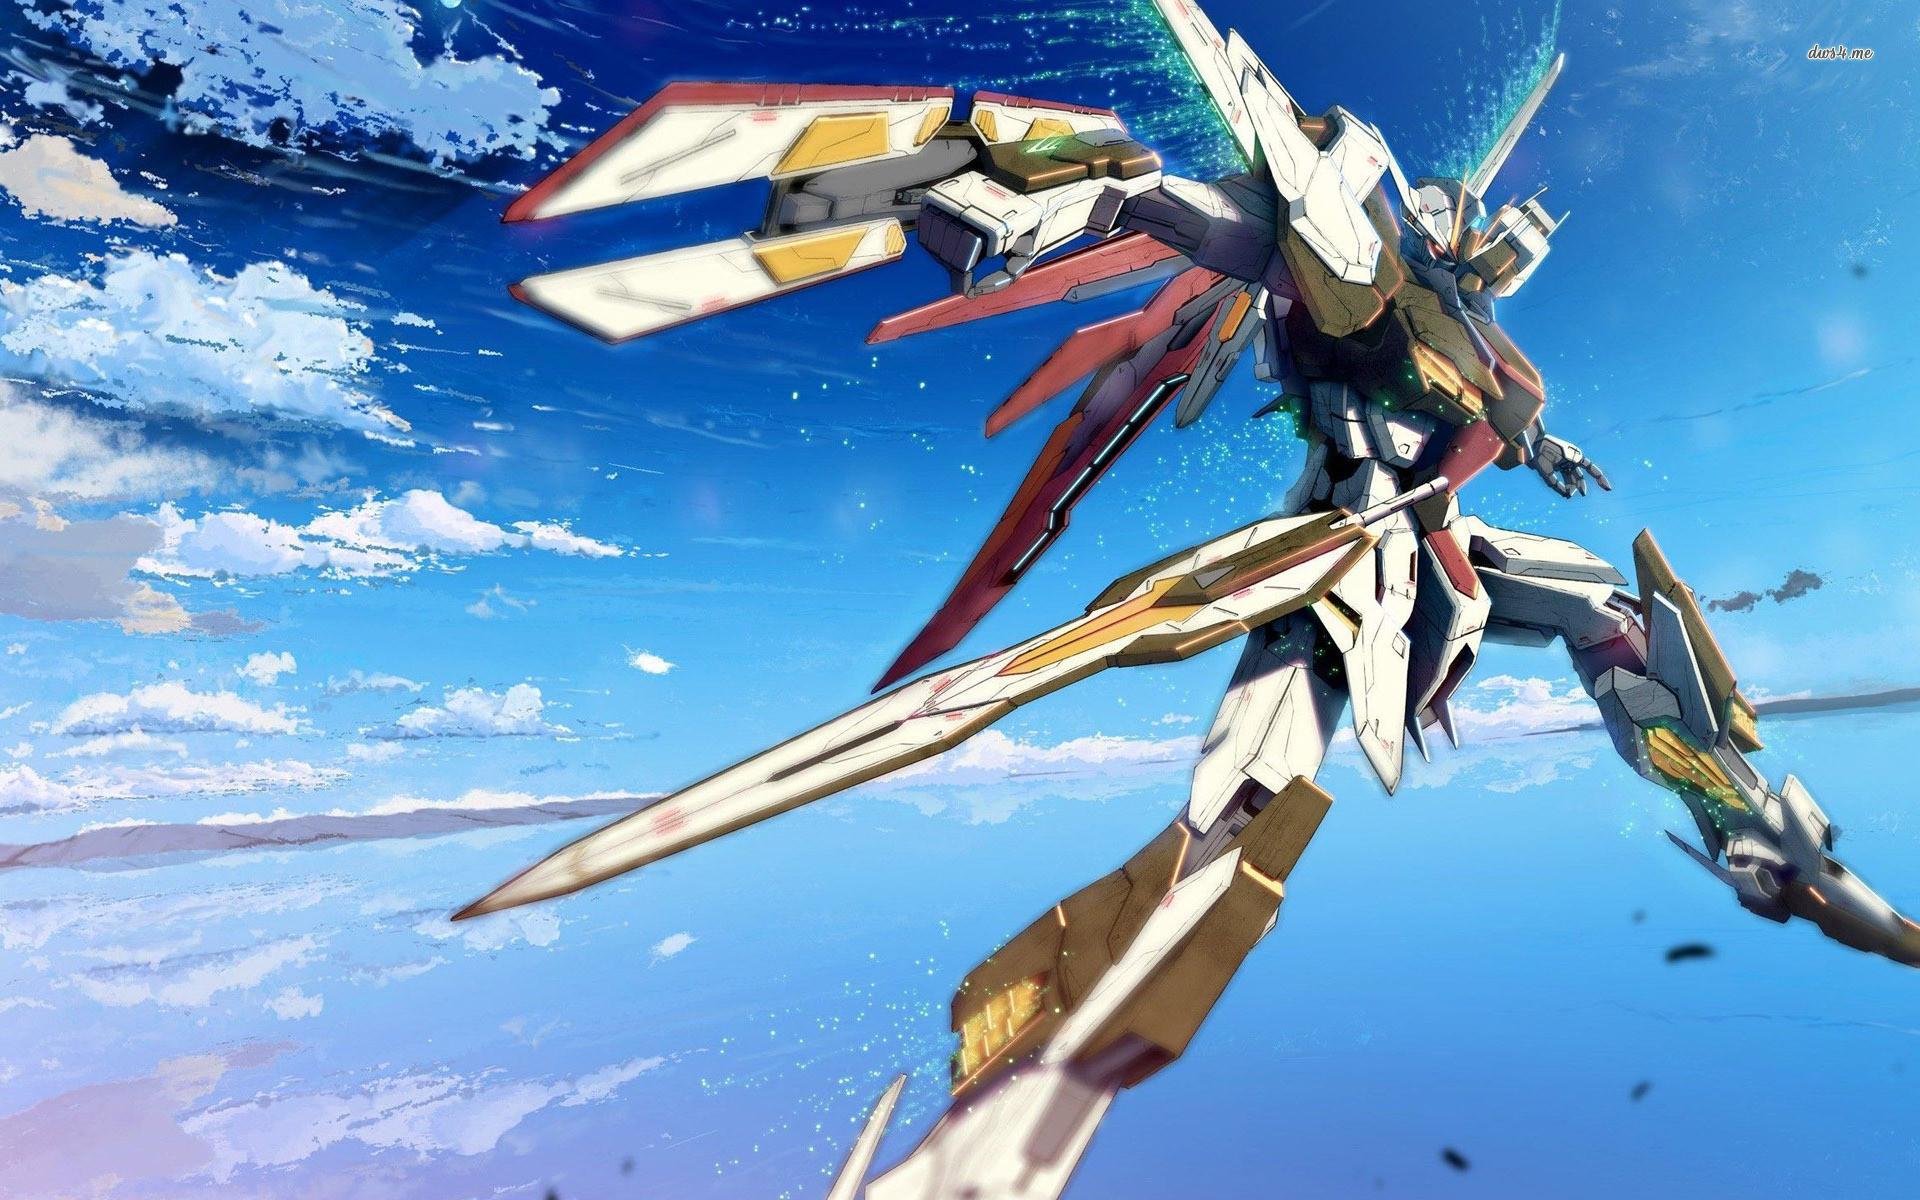 Image GN Gundam Exia Sky The Gundam Wiki   HD Wallpapers   Pinterest    Gundam, Hd wallpaper and Wallpaper